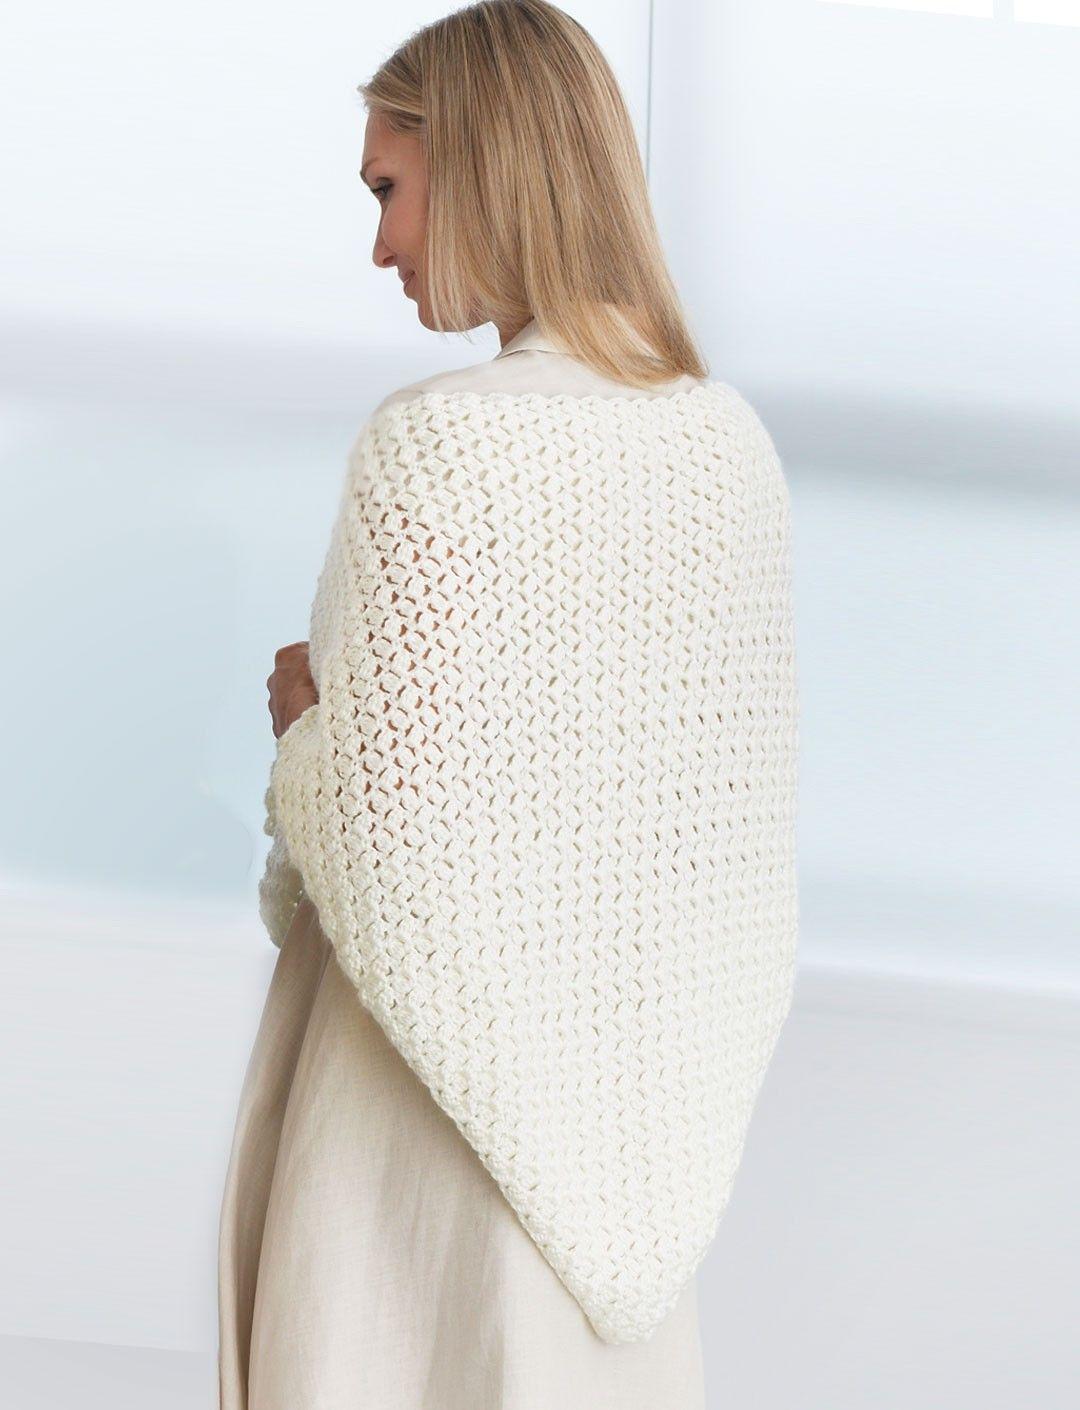 Yarnspirations.com+-+Bernat+Crochet+Prayer+Shawl+-+Patterns++|+ ...